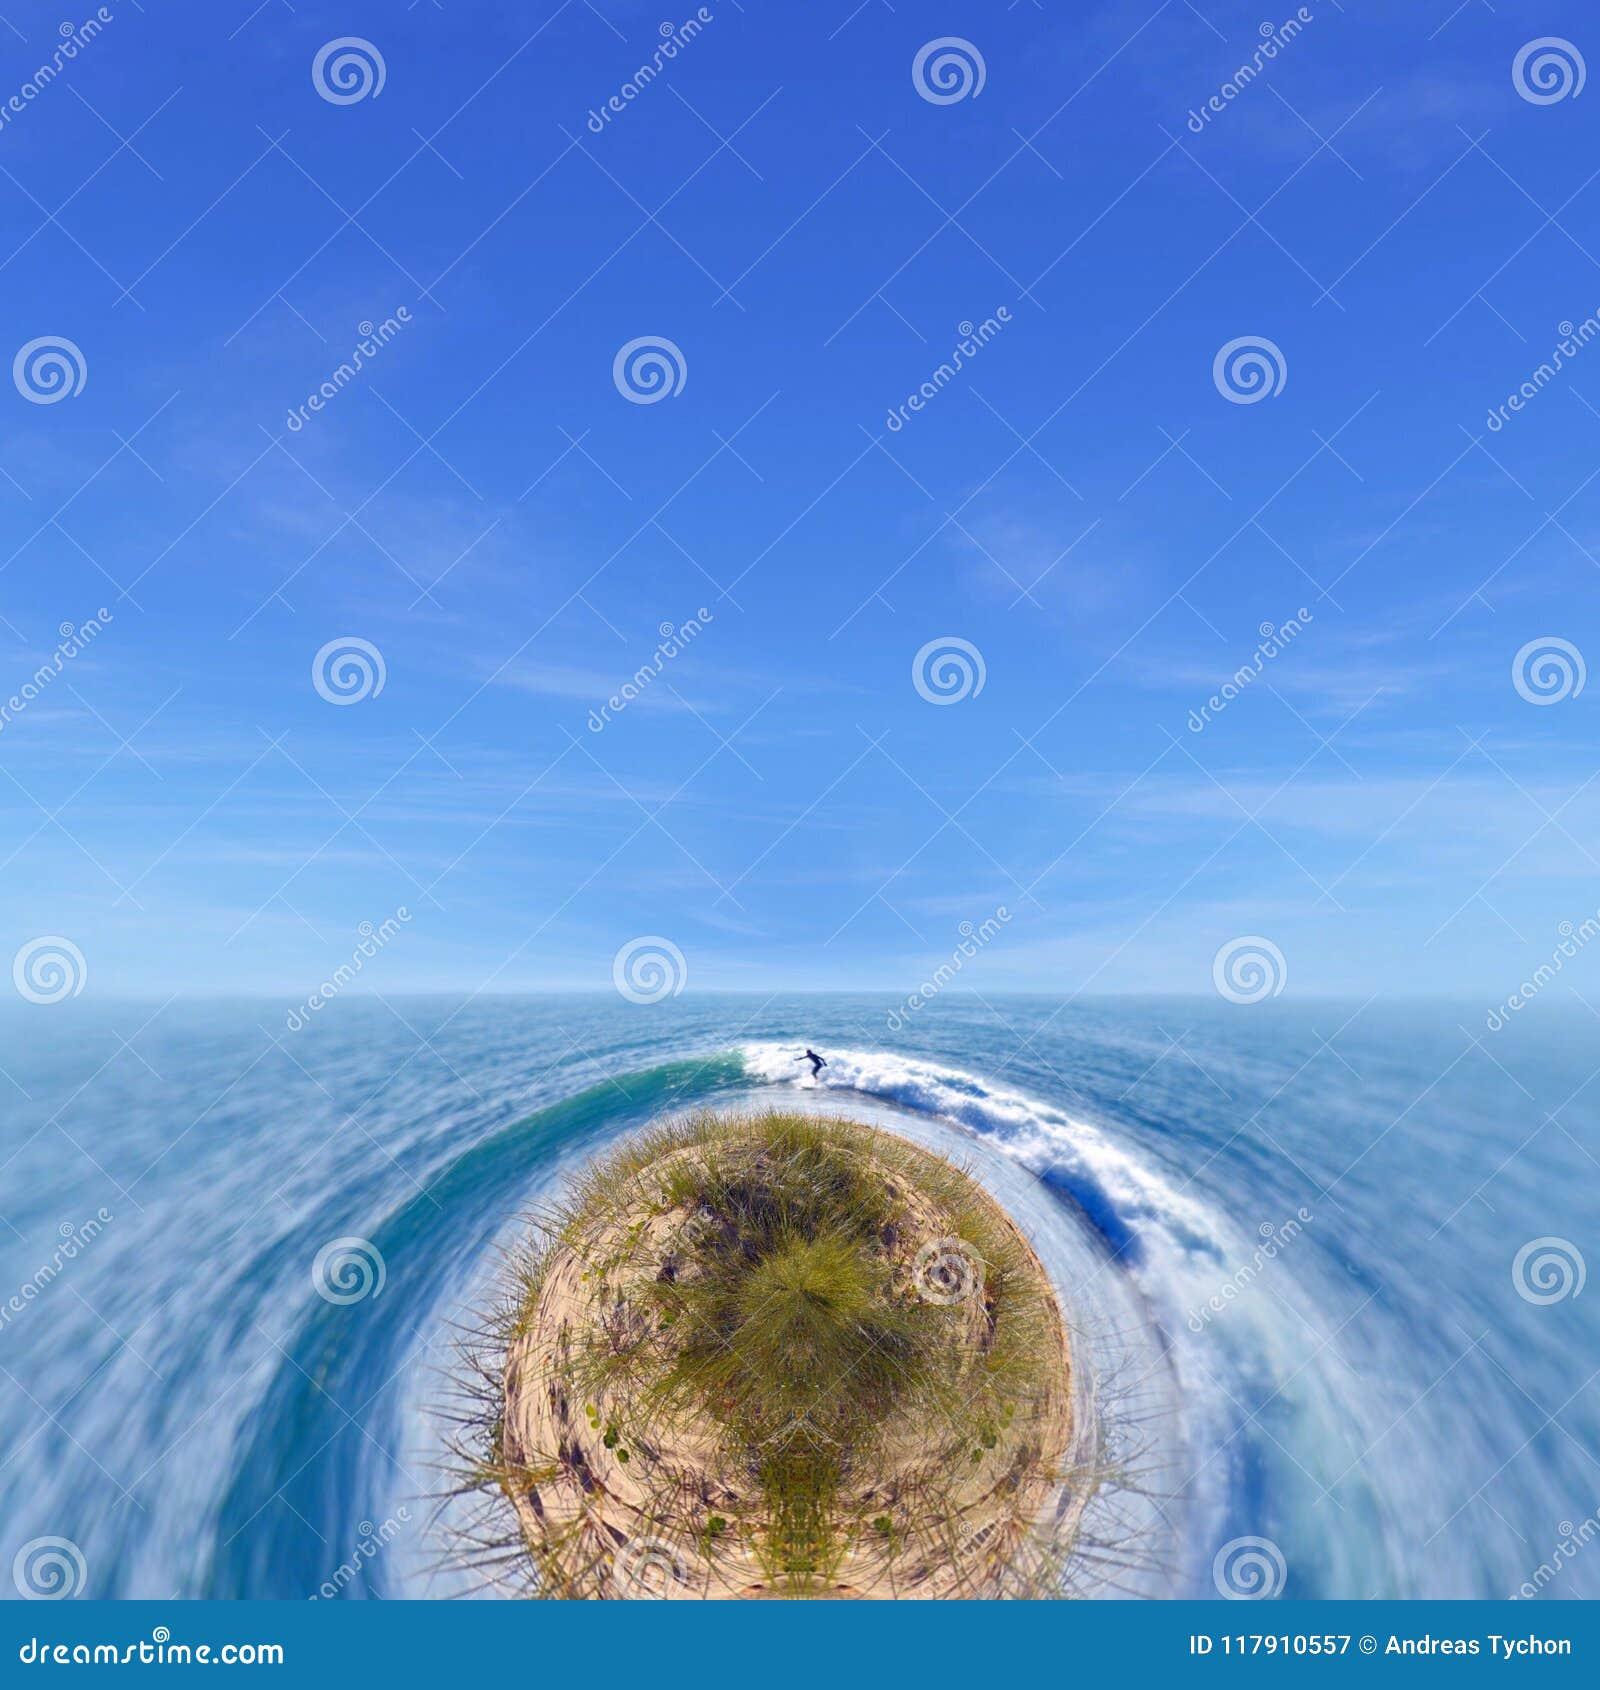 Surfing Ocean Fantasy Stock Image Image Of Island Ocean